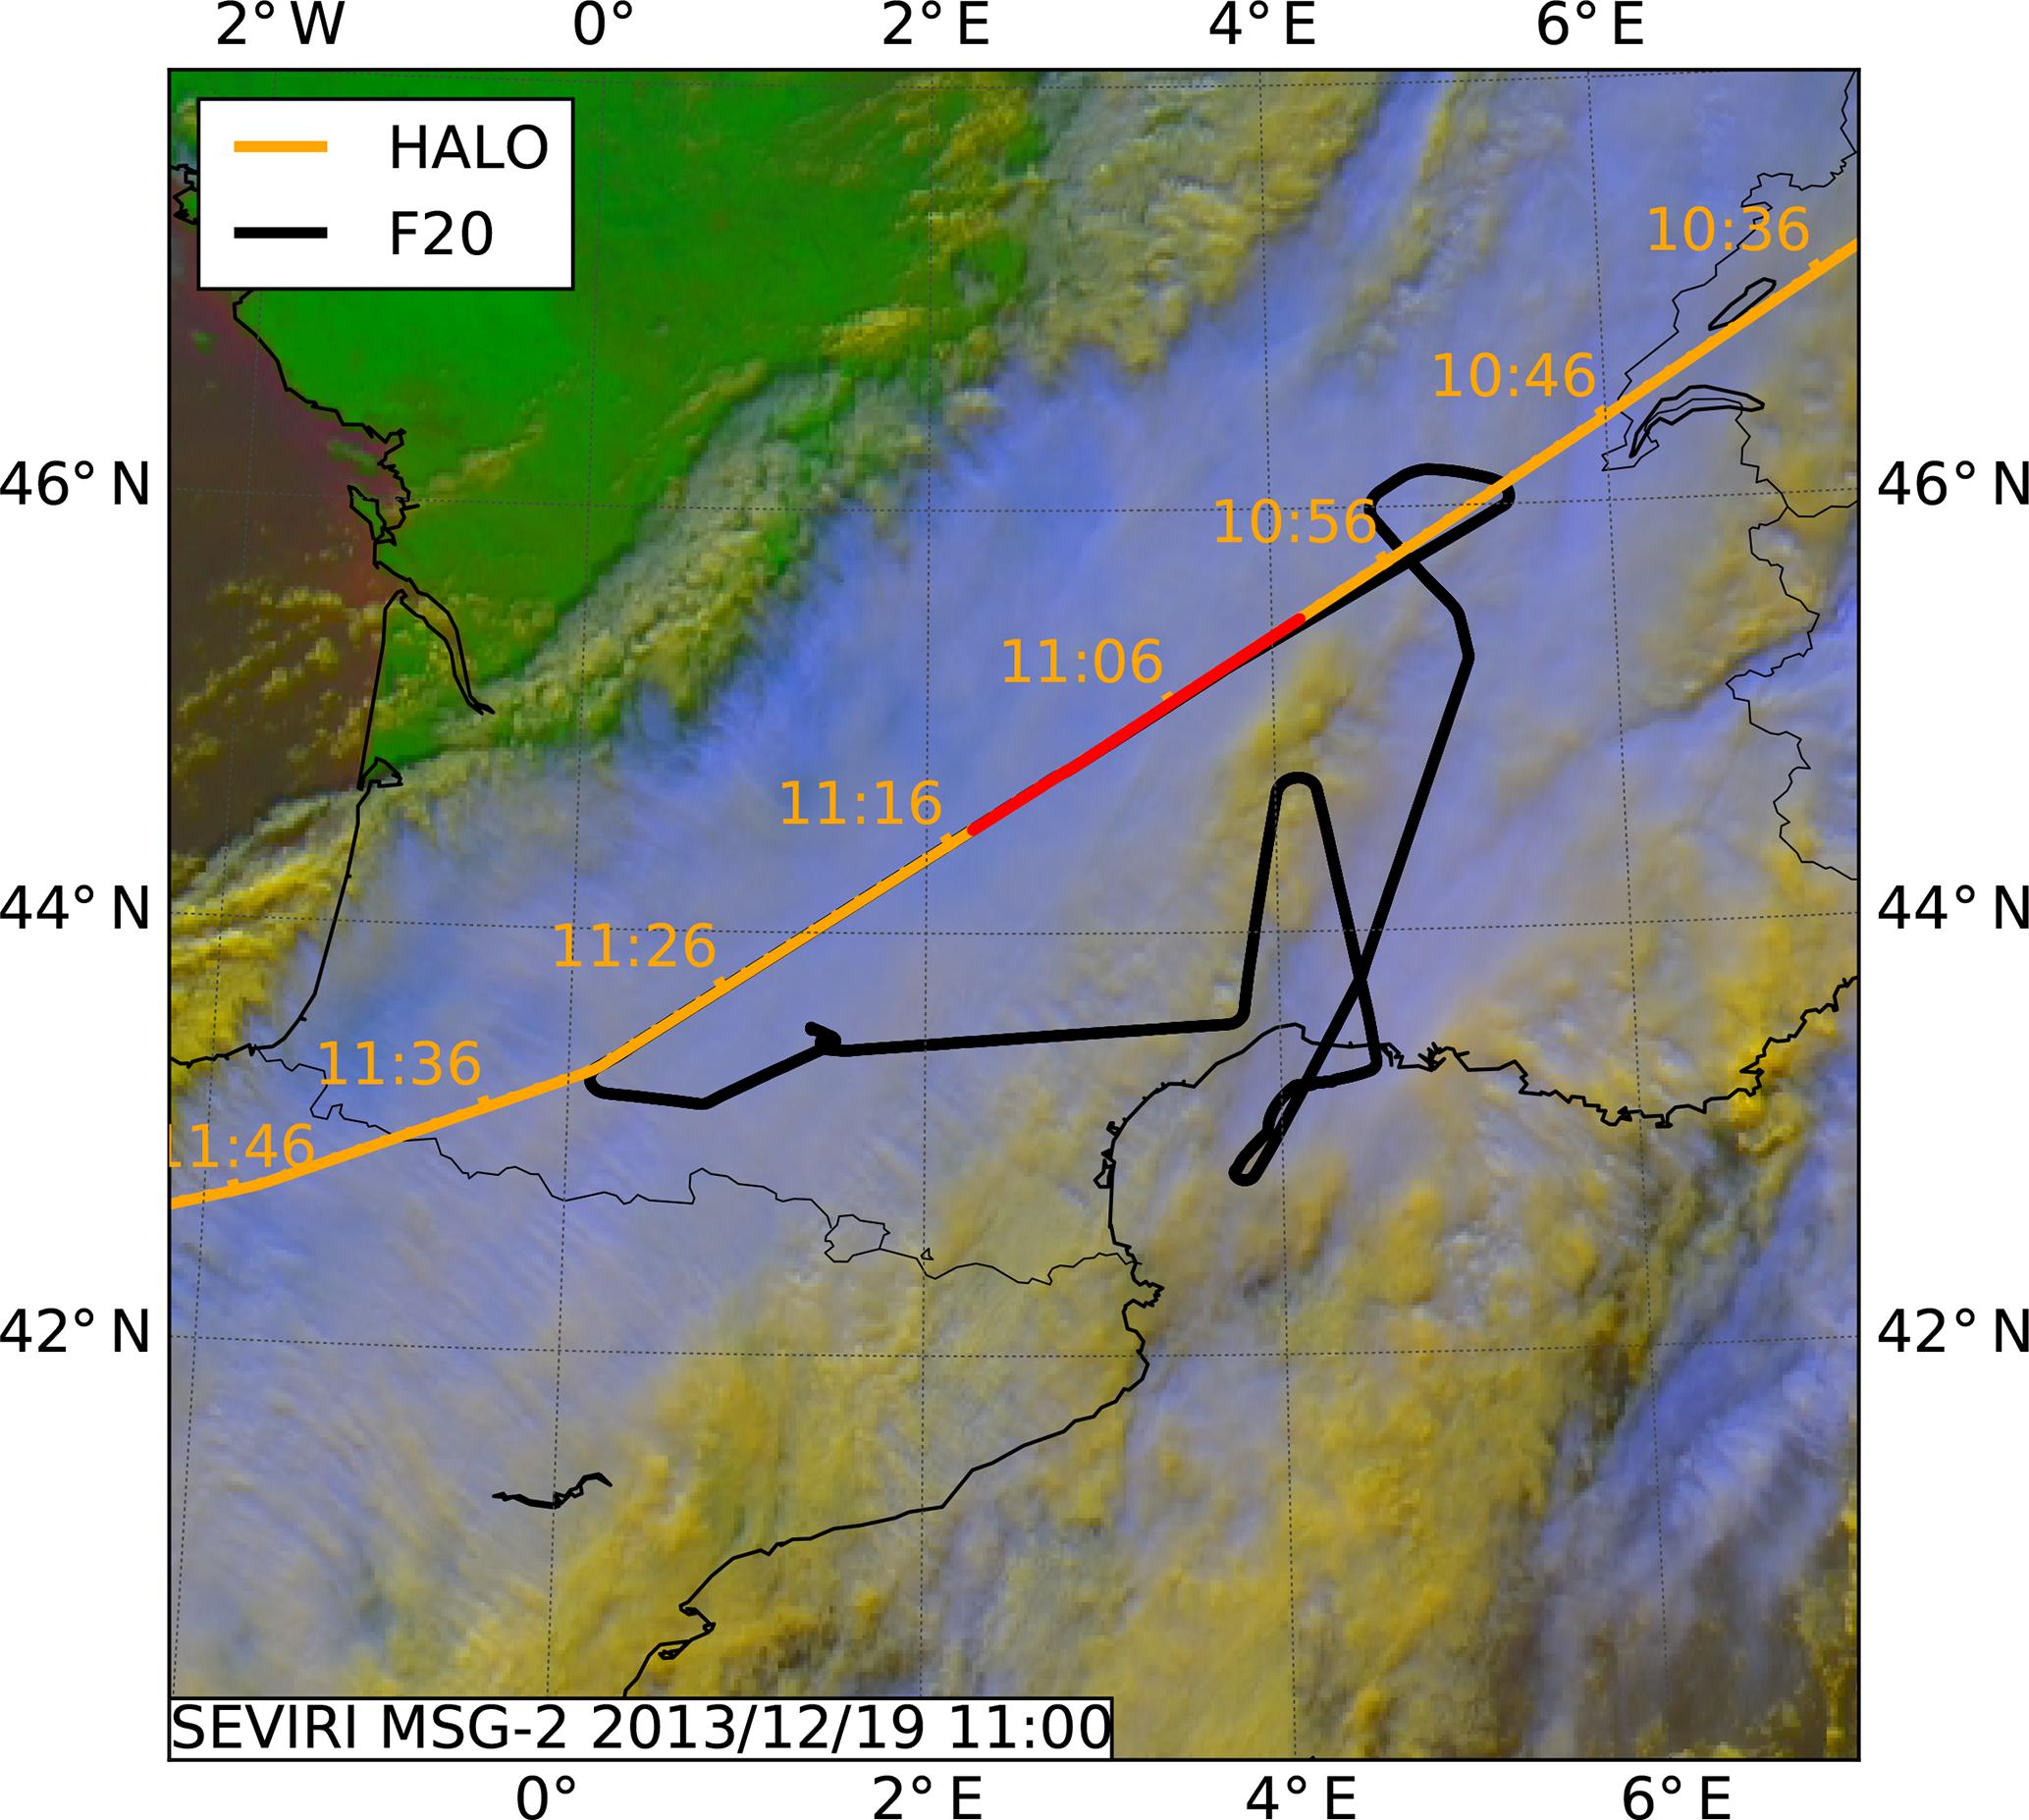 AMT - Calibration of a 35 GHz airborne cloud radar: lessons